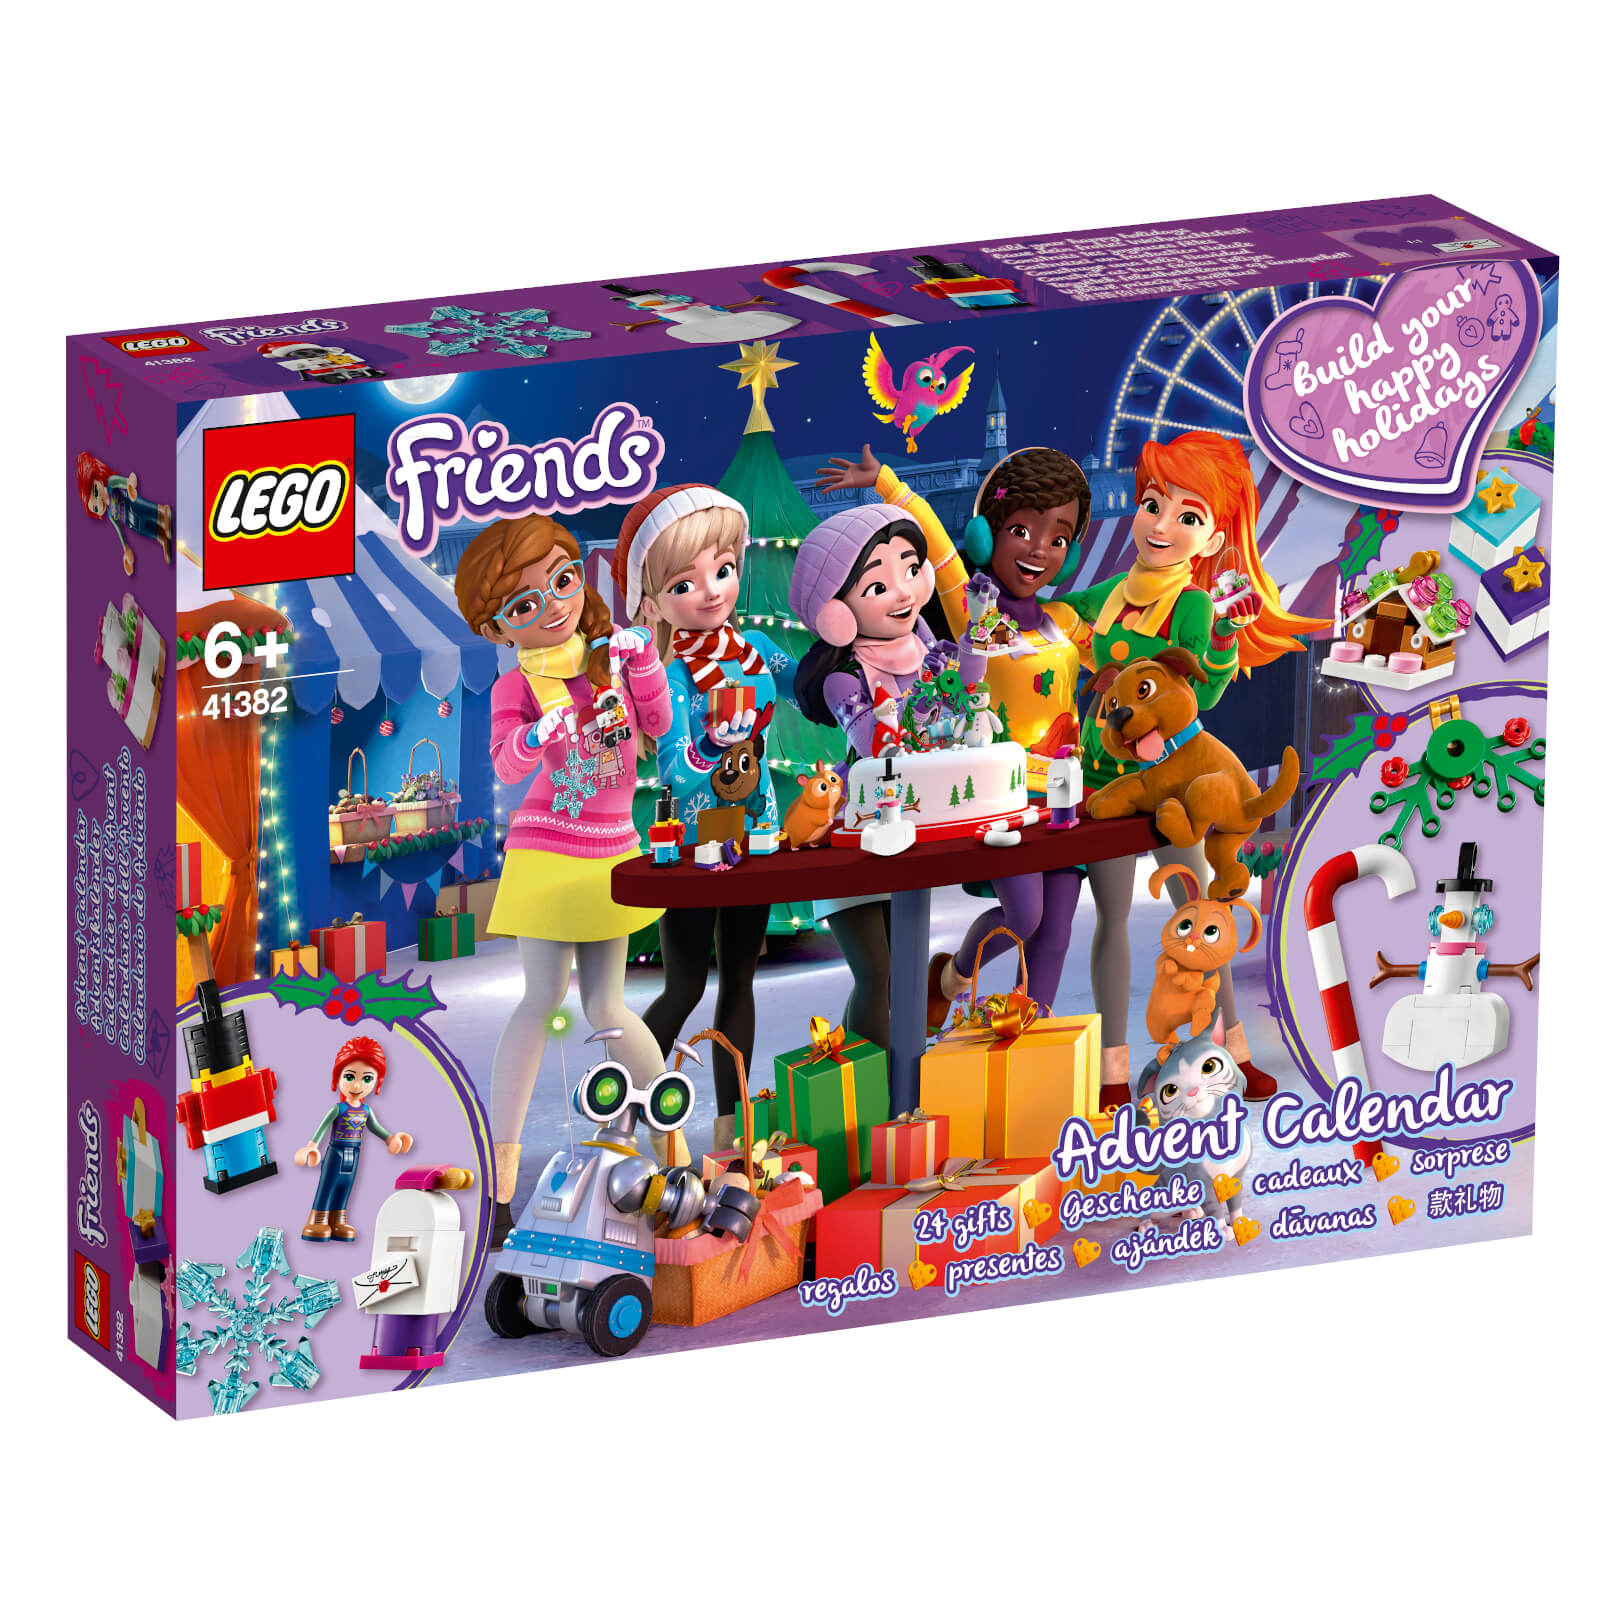 Calendrier Gotham.Lego Friends Friends Advent Calendar 41382